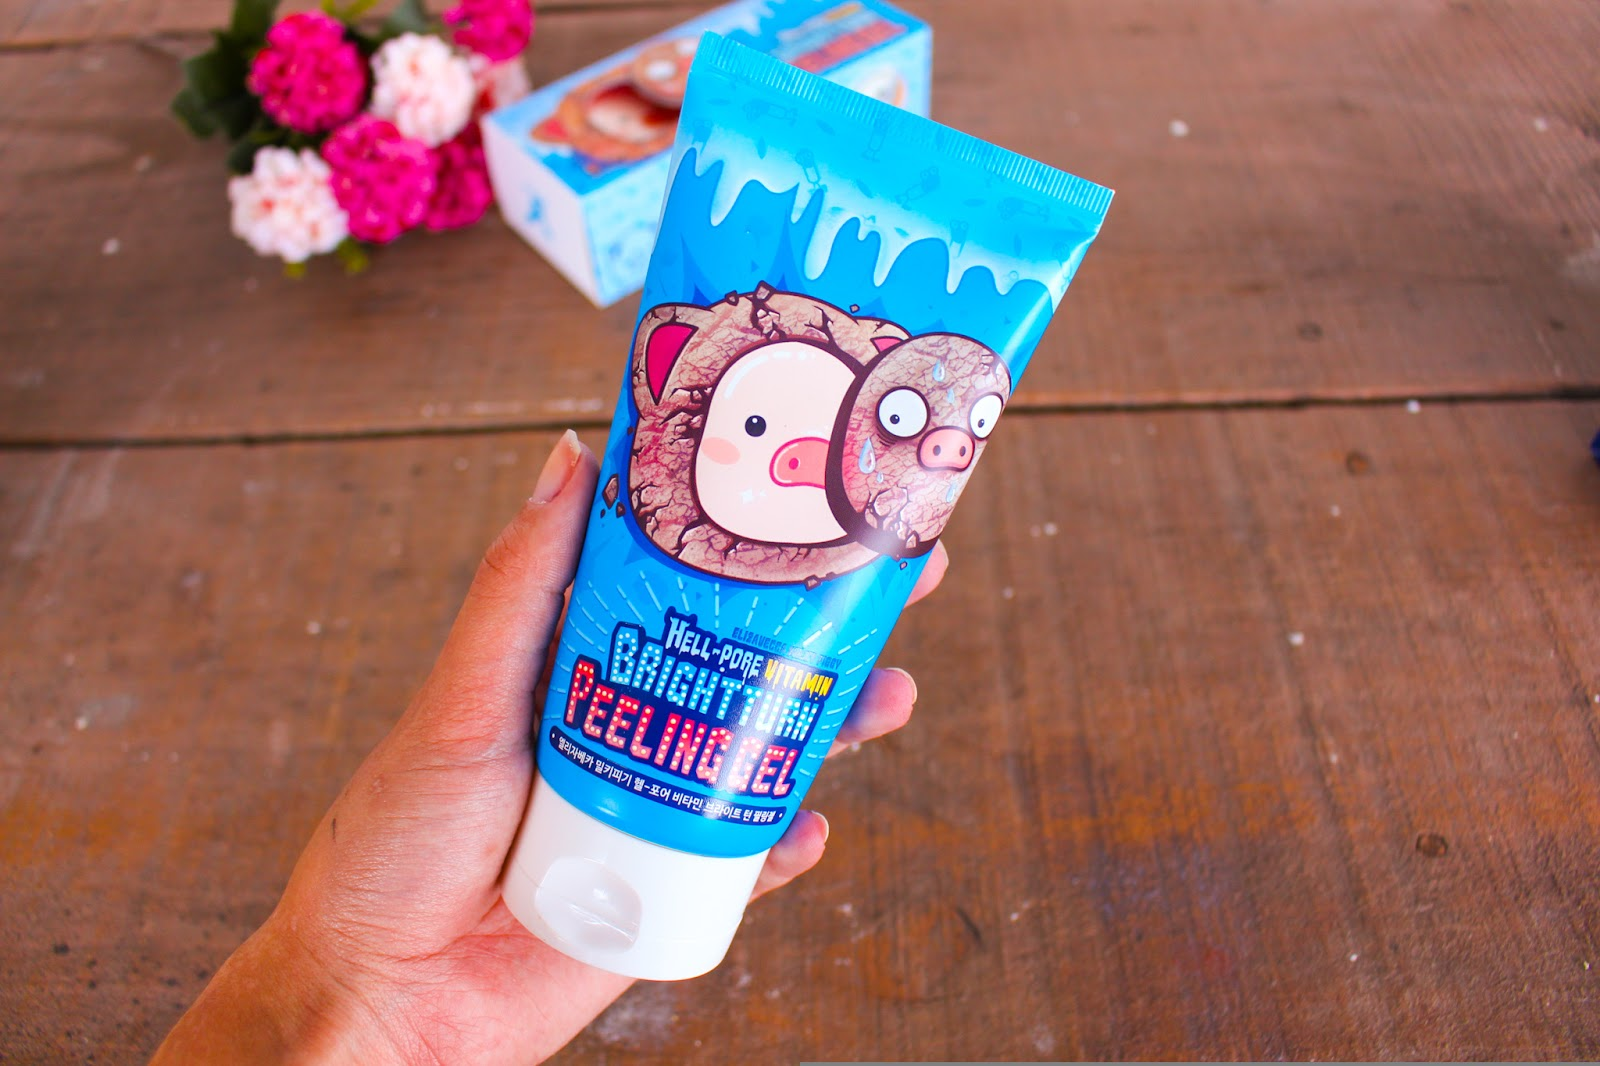 Resenha: Hell Pore Vitamin Peeling Gel Elizavecca